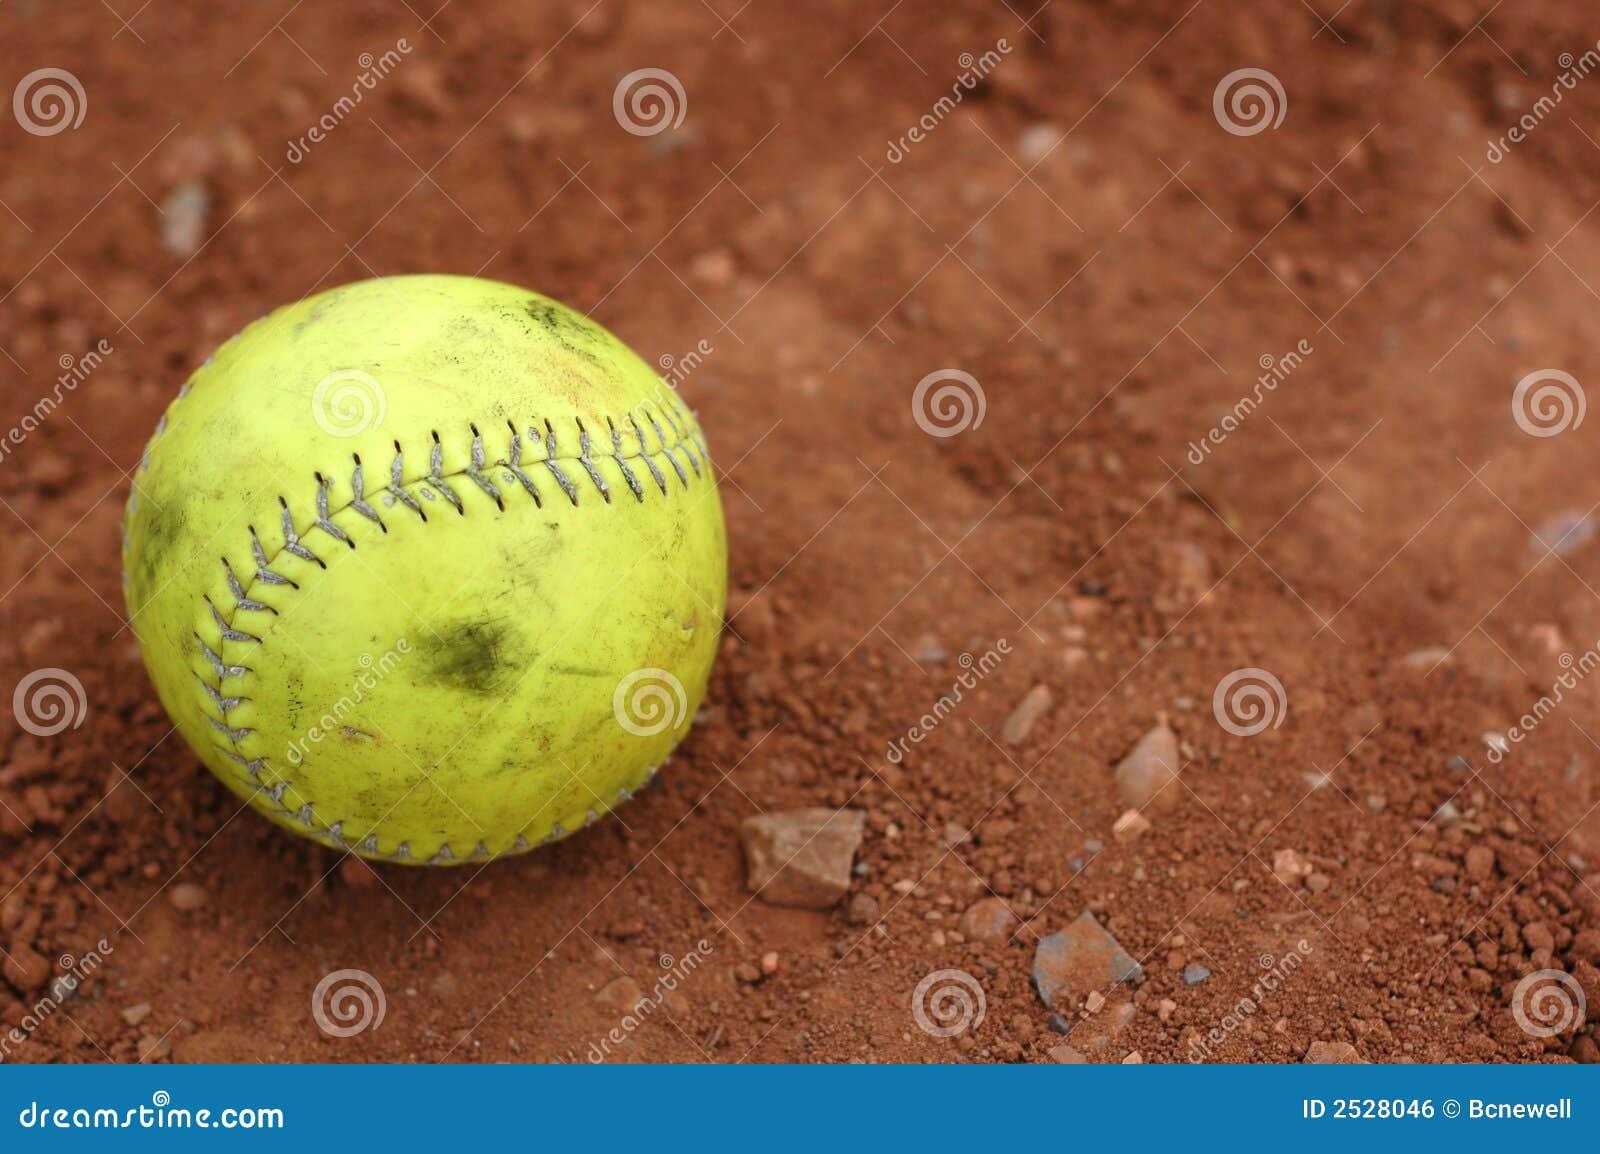 Softball, well used